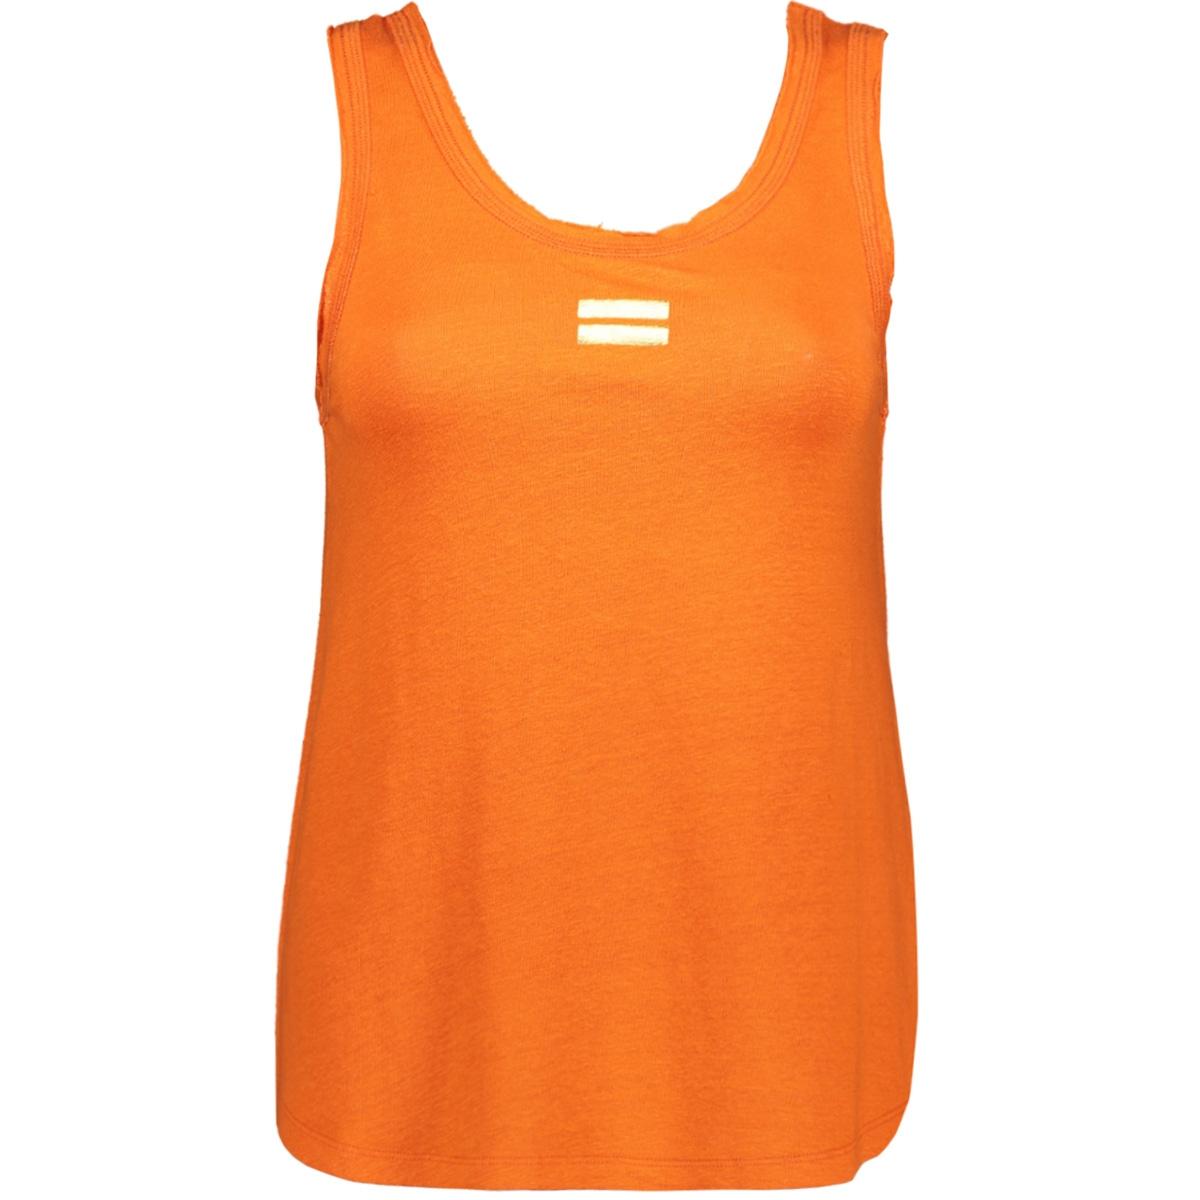 top linen 20 450 0202 10 days top royal orange